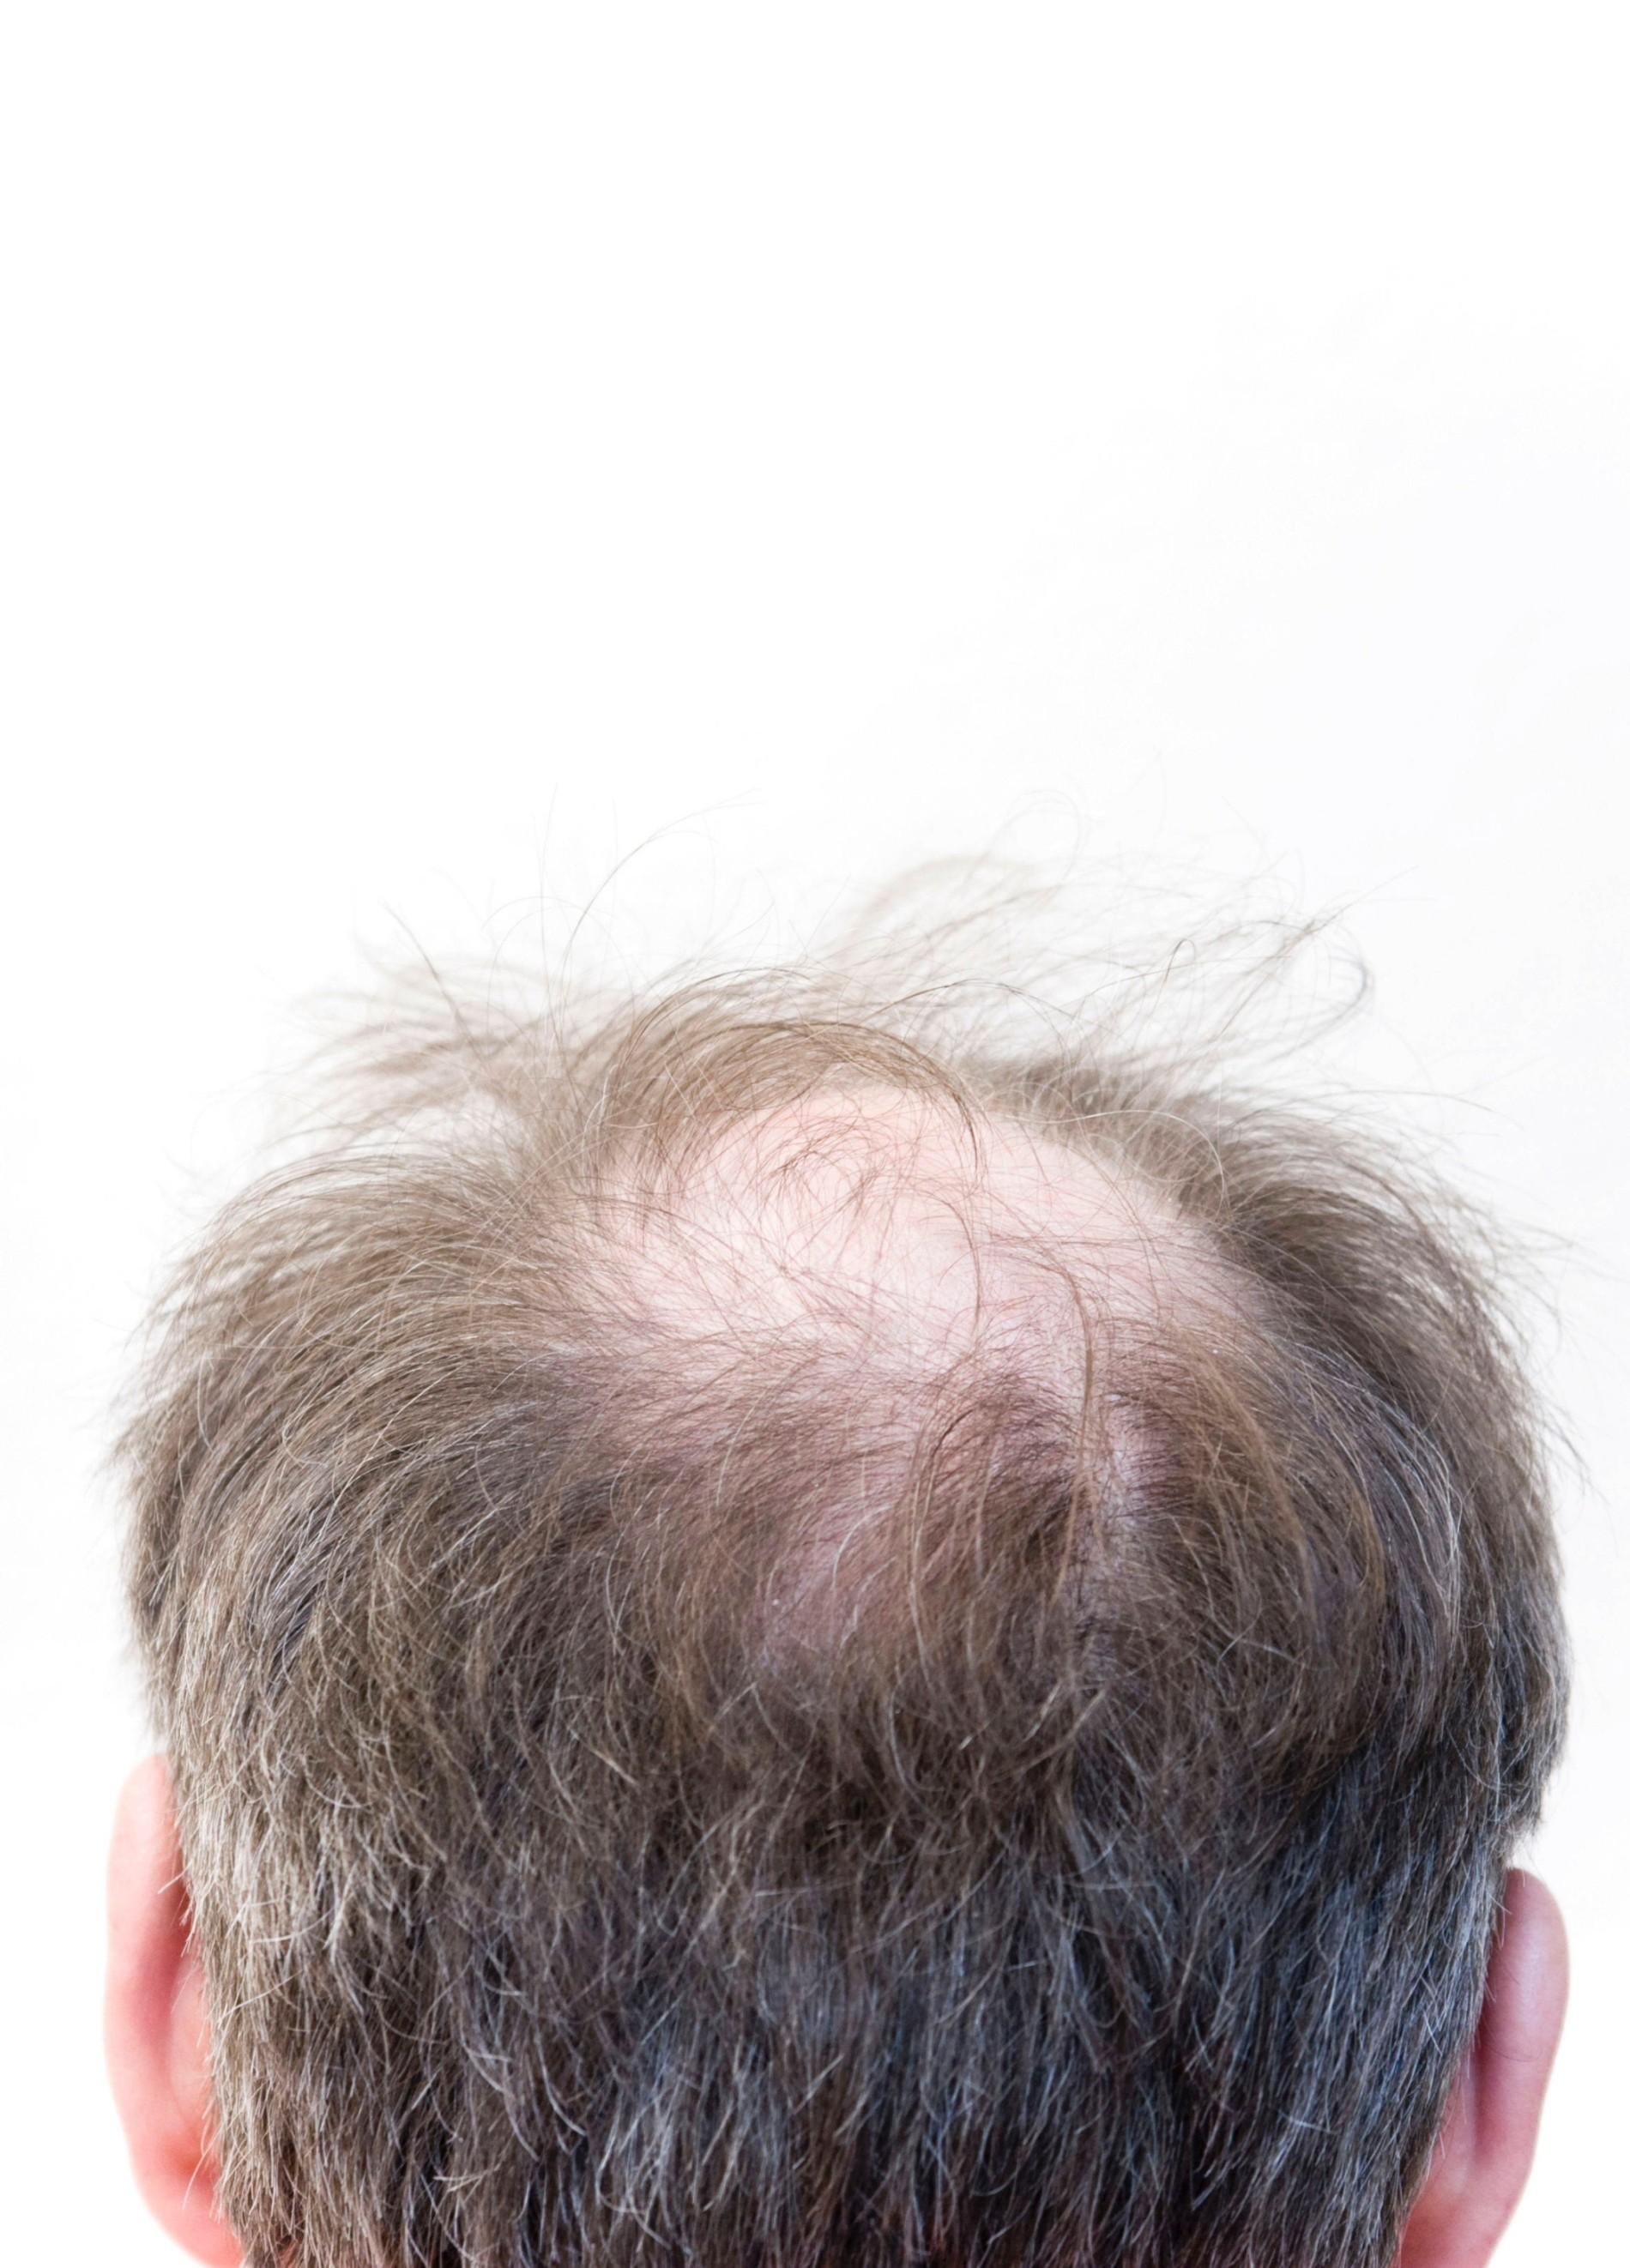 Geheimratsecken regain Hair transplant